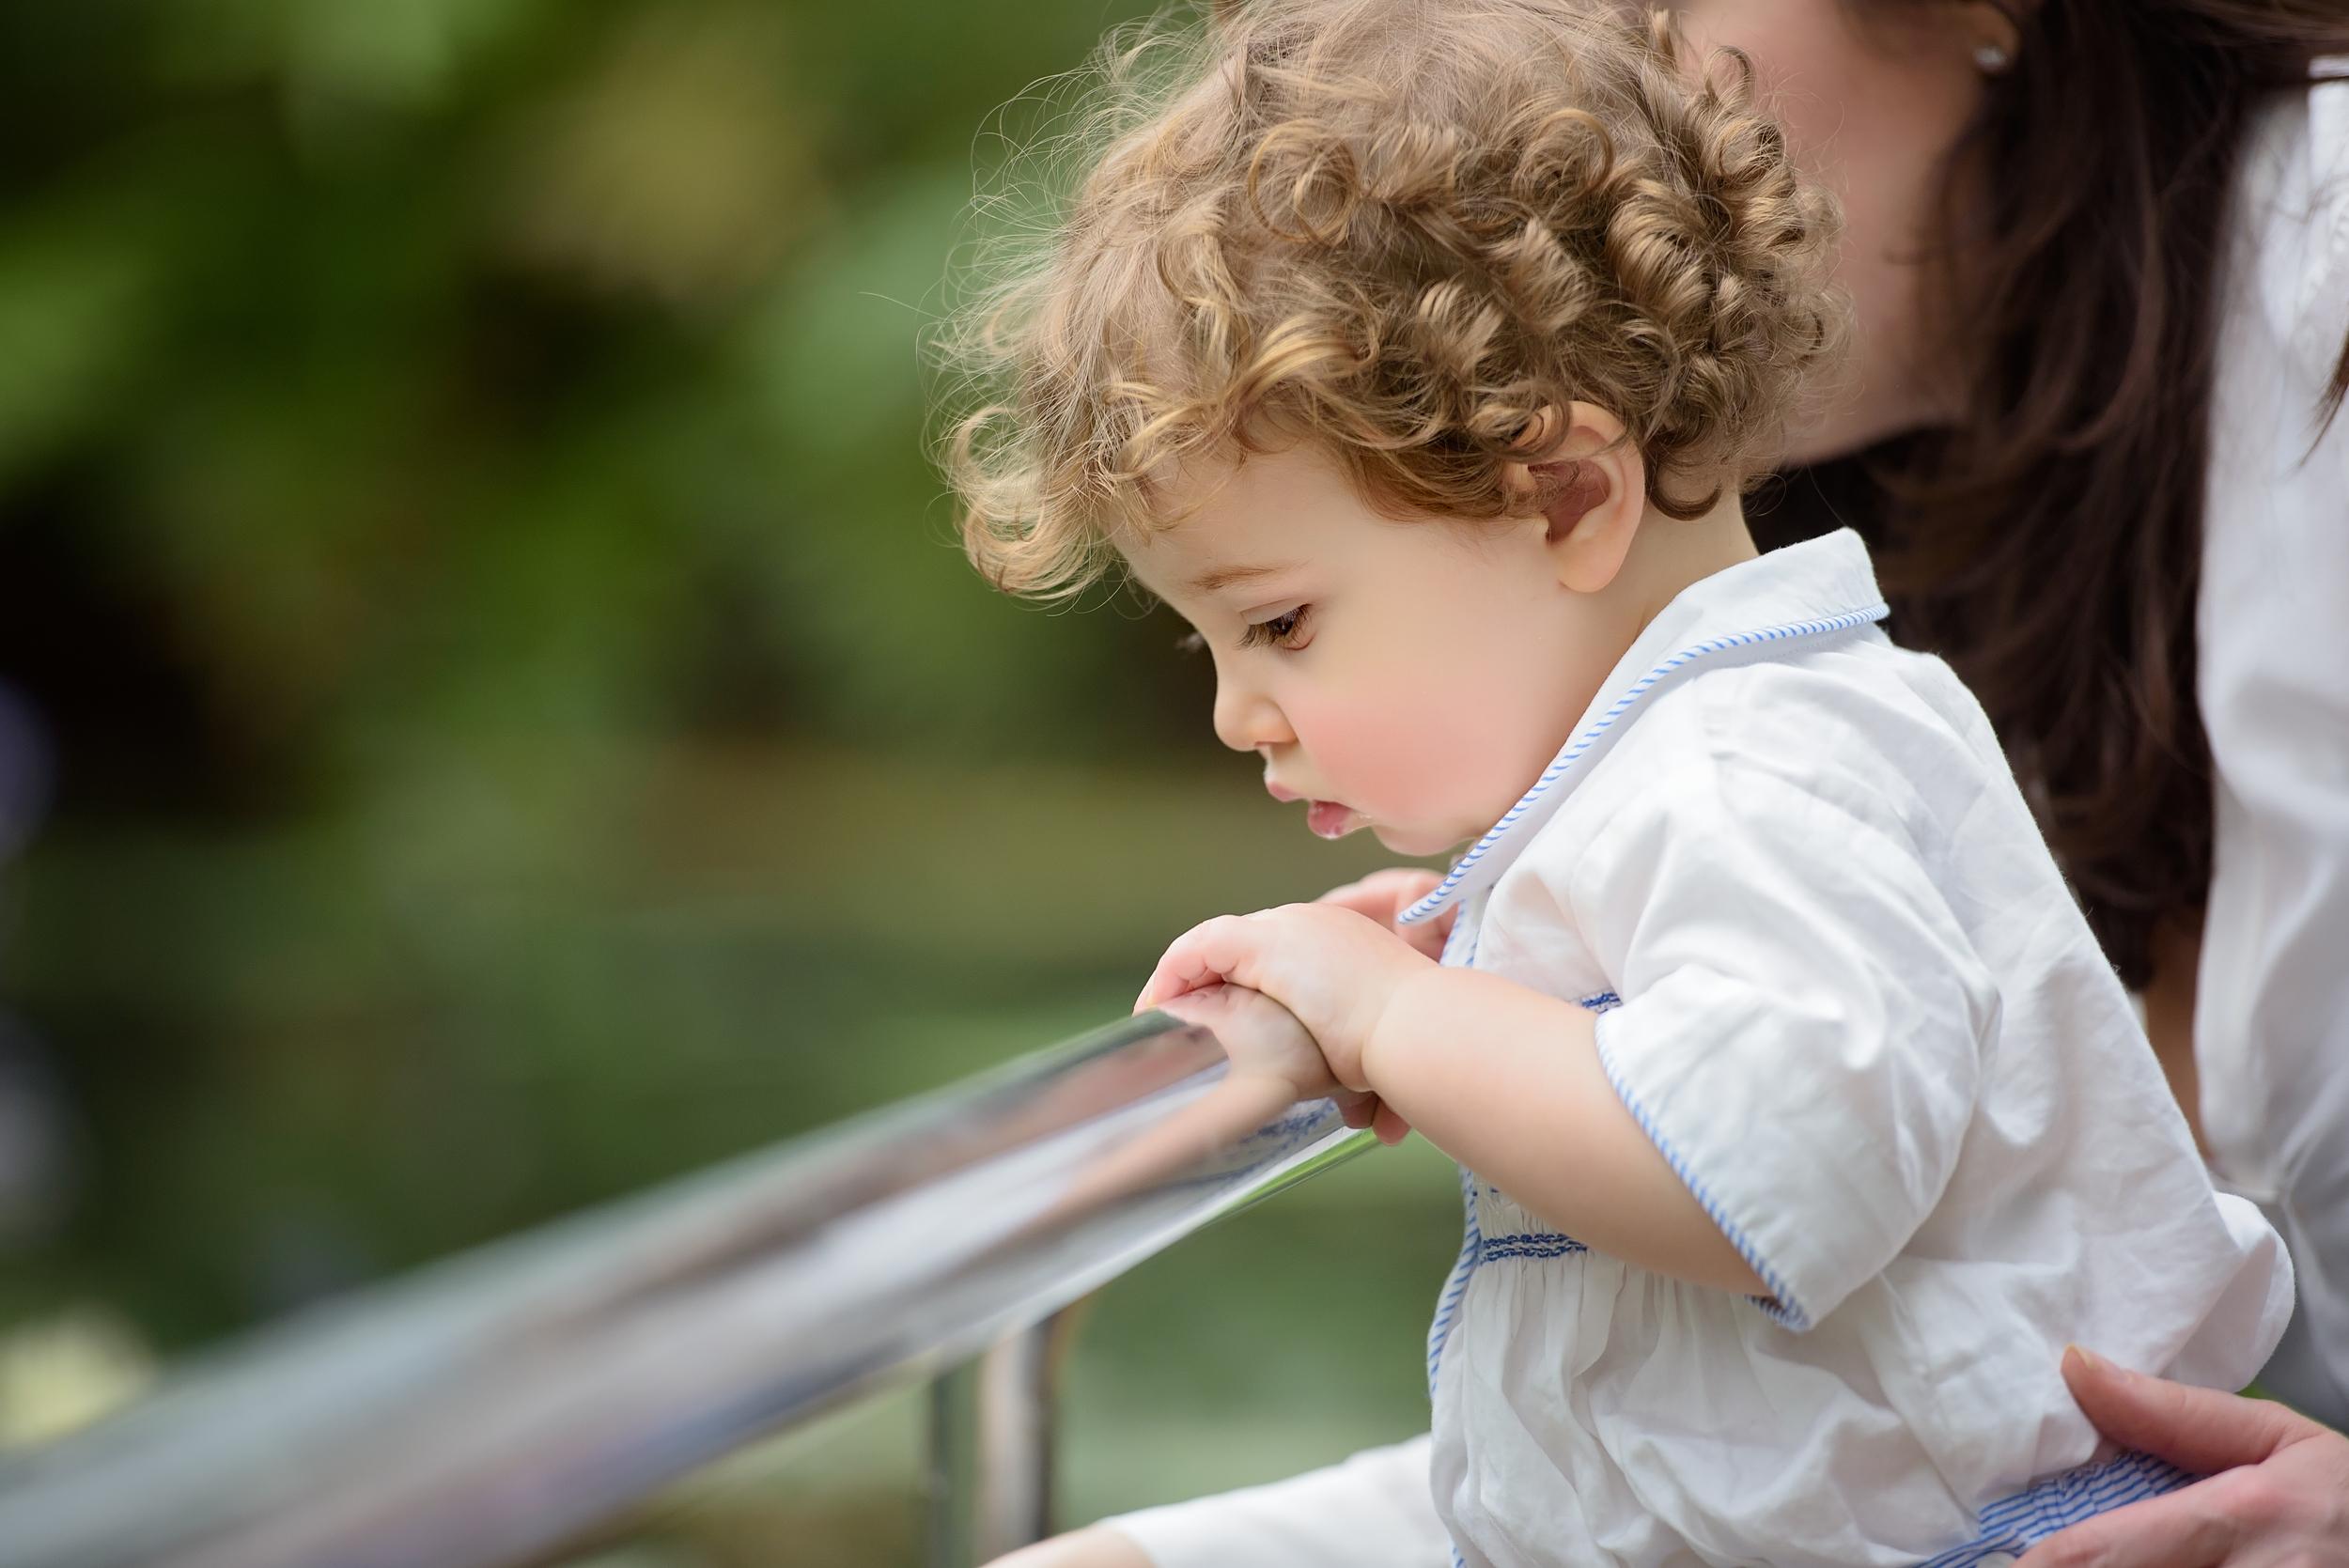 Kew Gardens child portraits